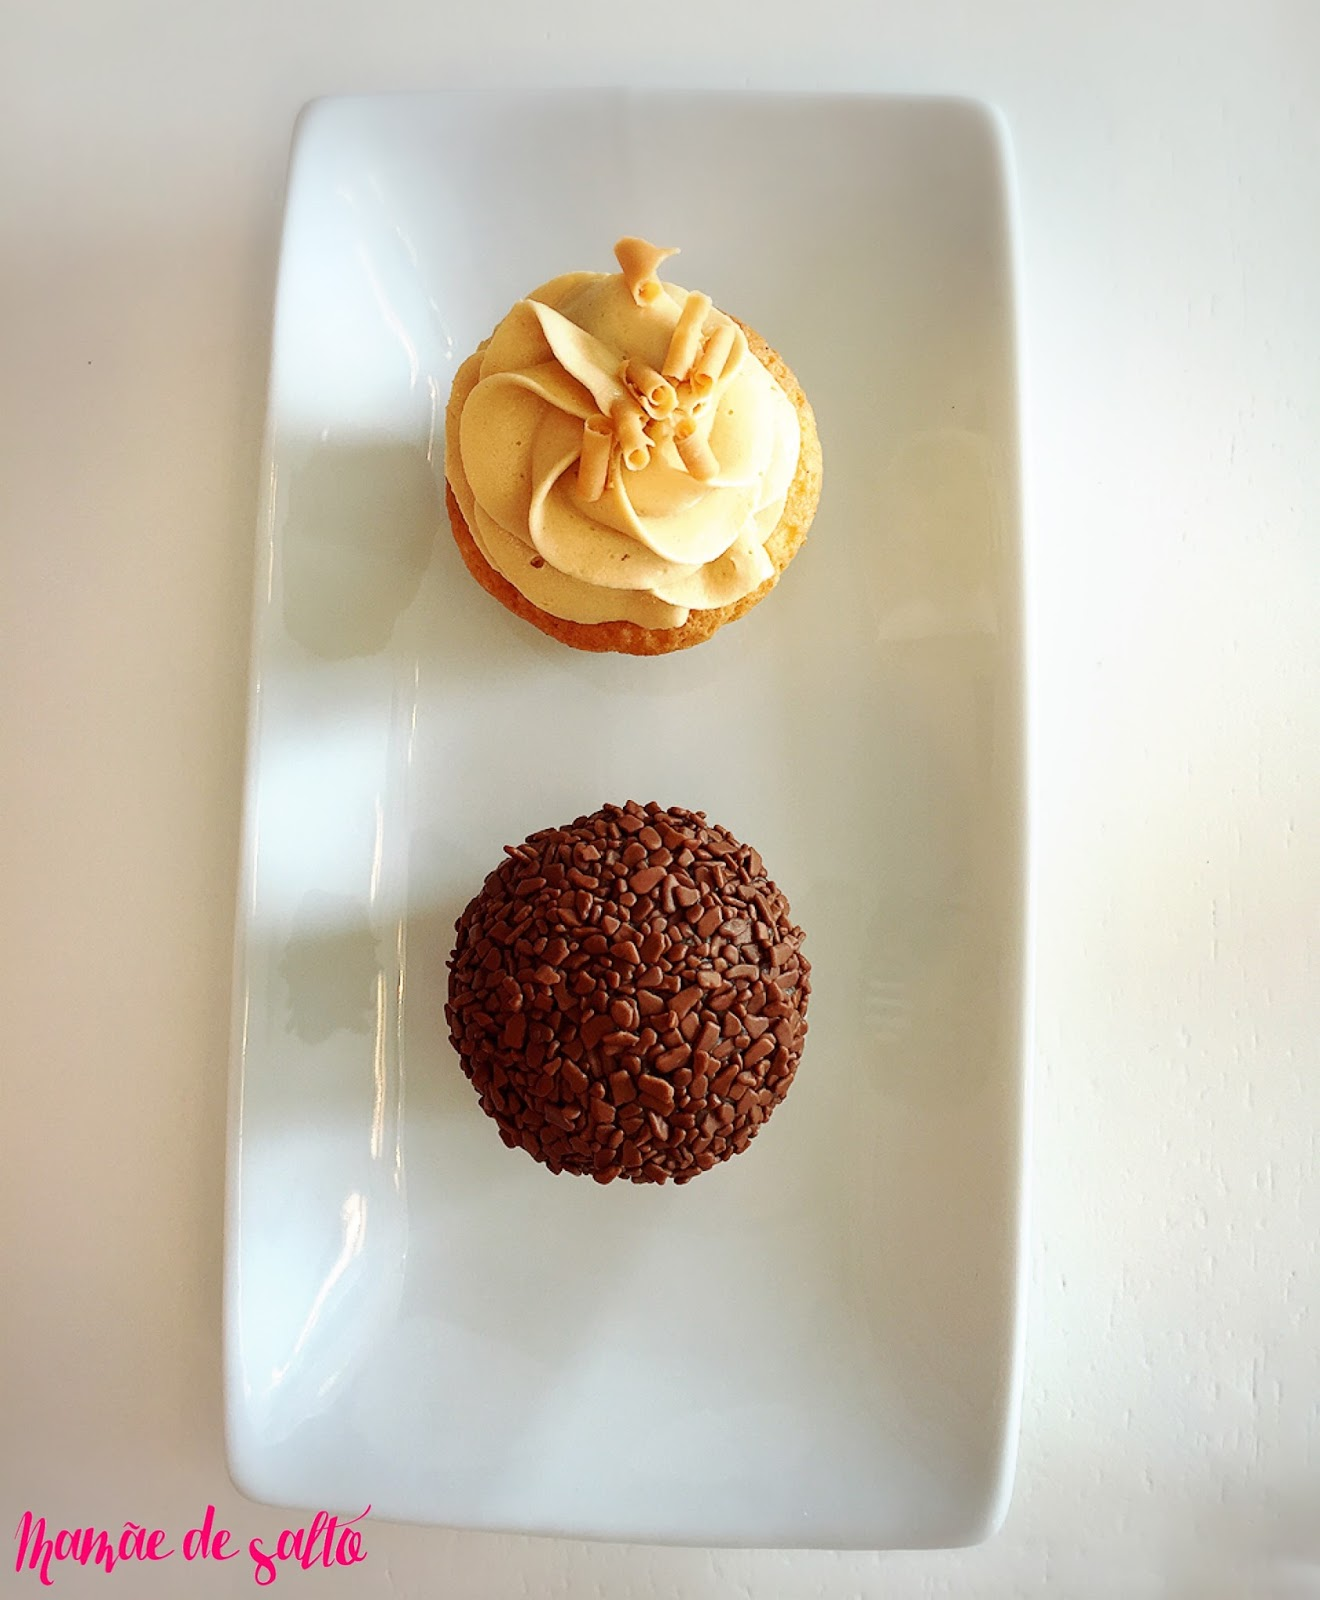 cupcake chocolate belga e doce de leite Sugar Bakery Curitiba/PR ... blog Mamãe de Salto